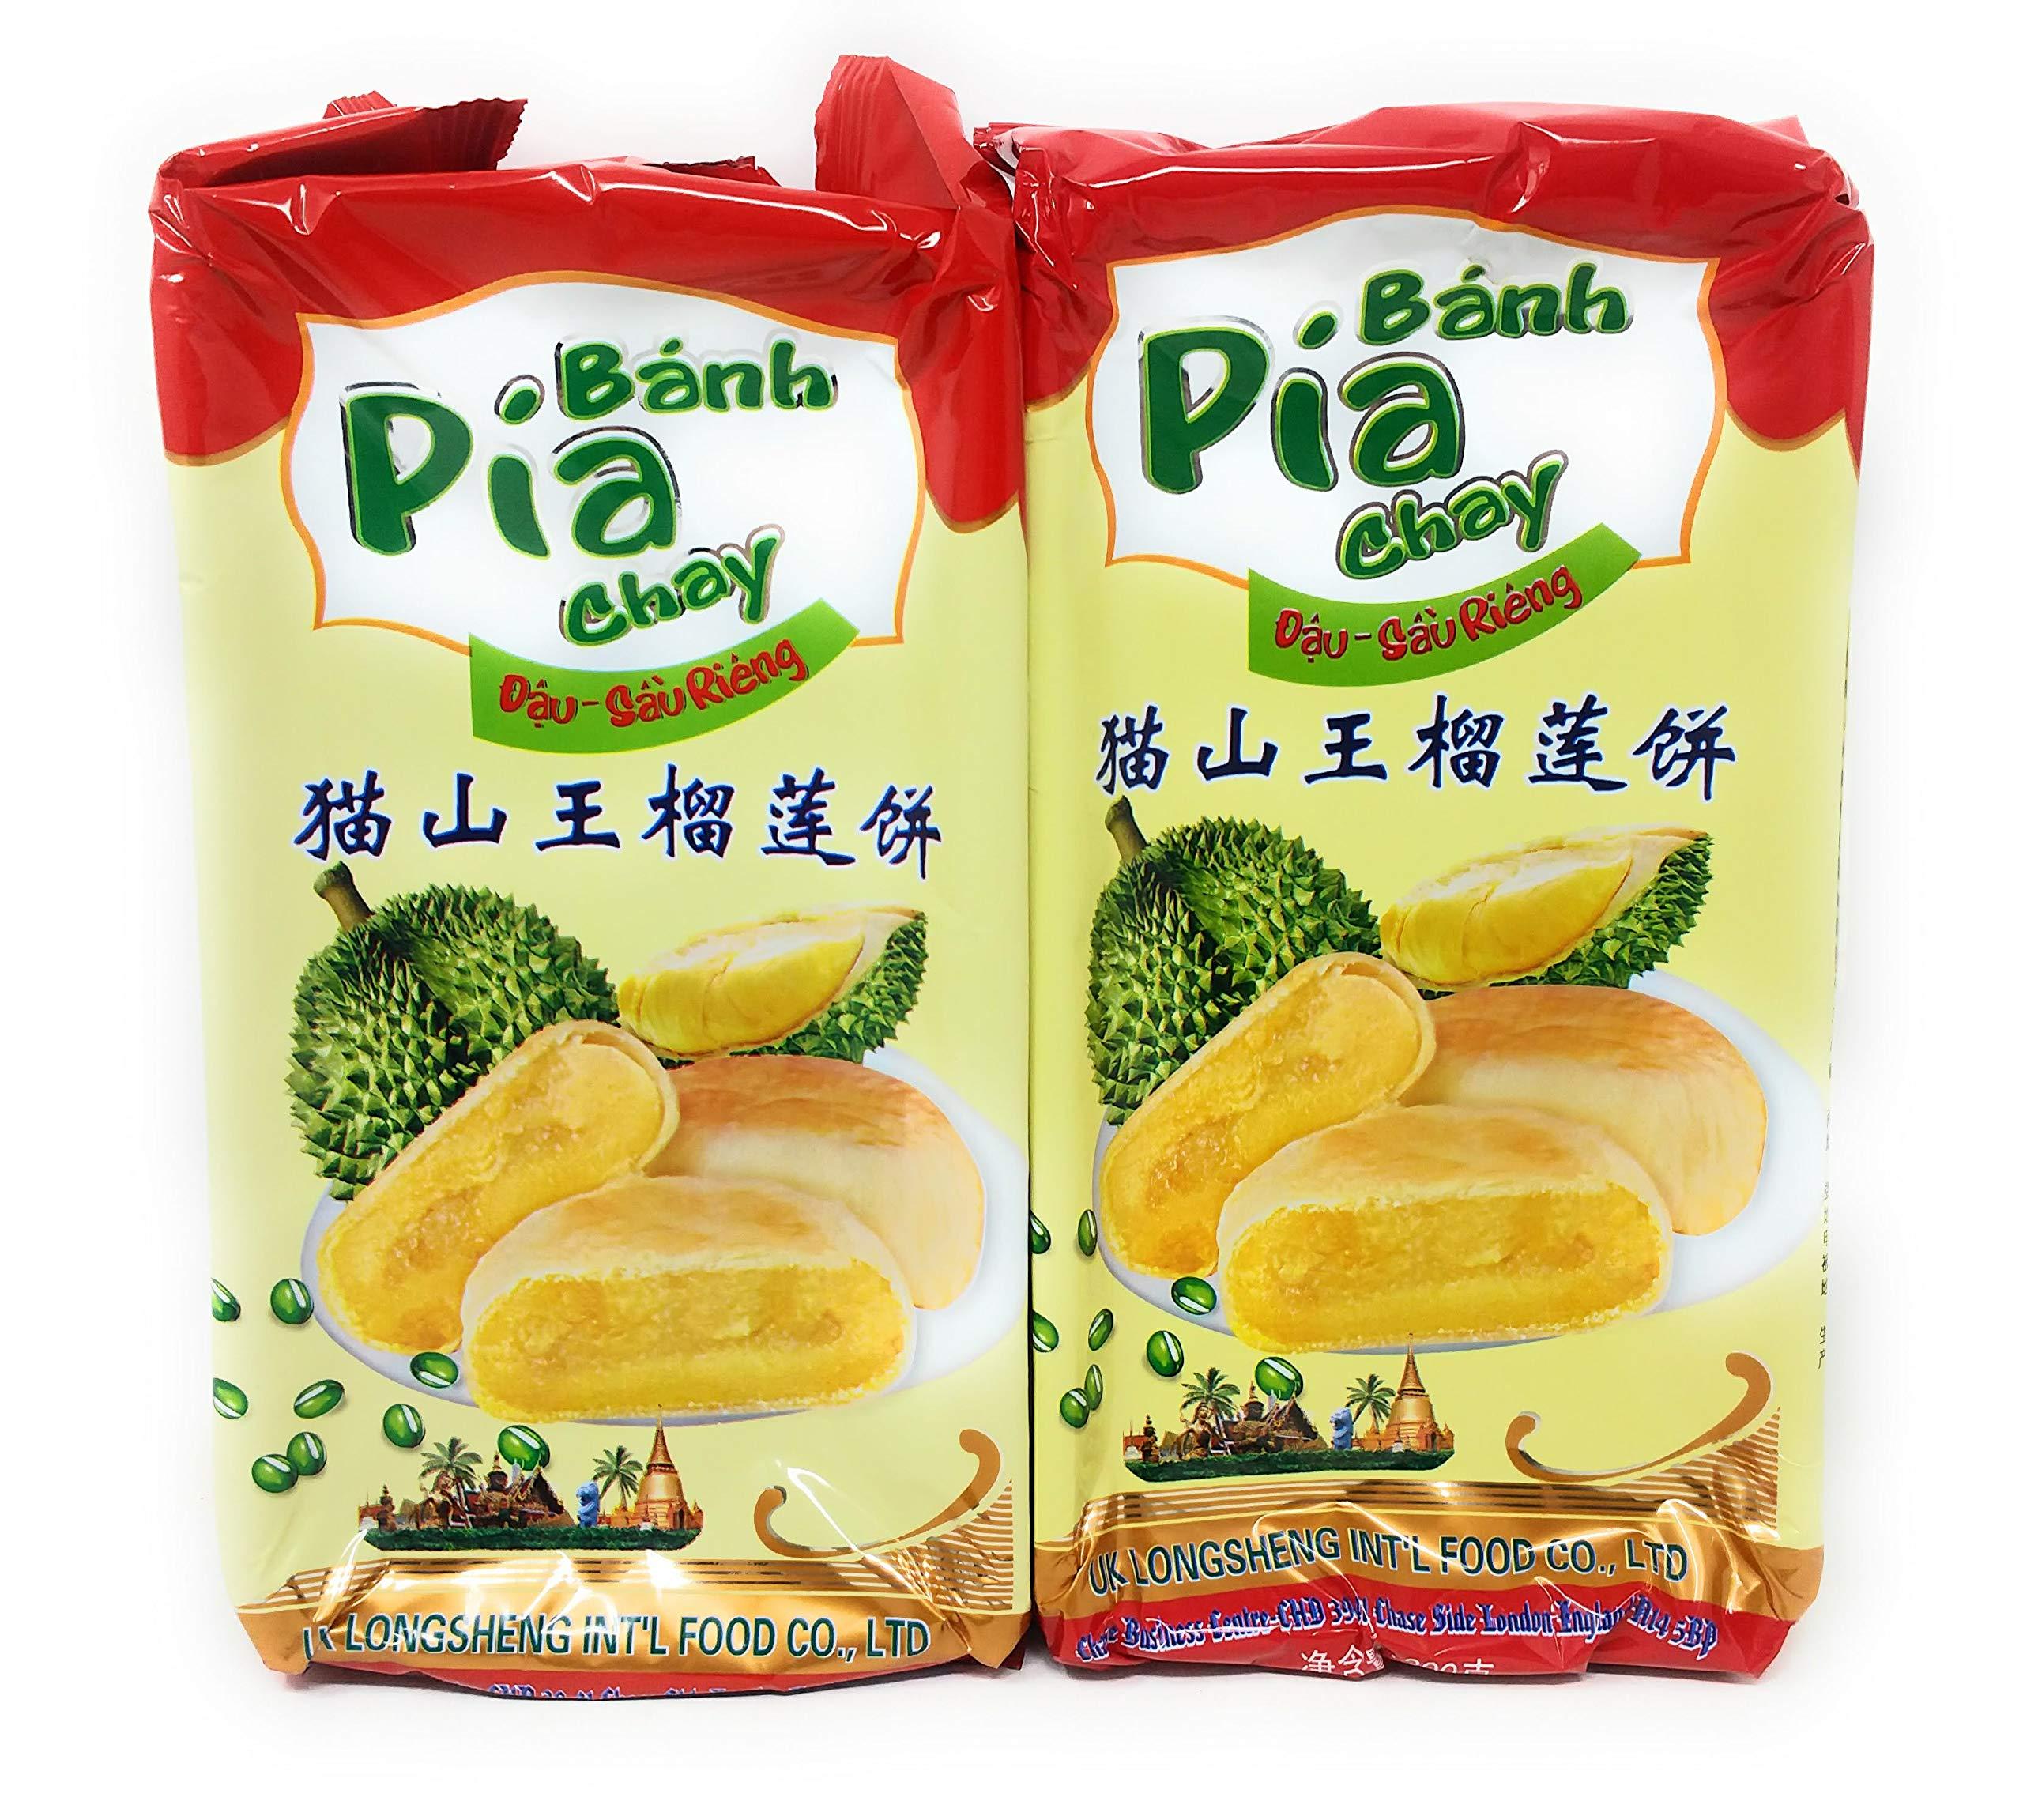 Banh Pia Chay Durian Cake 300g, 2 Pack by Banh Pia Chay